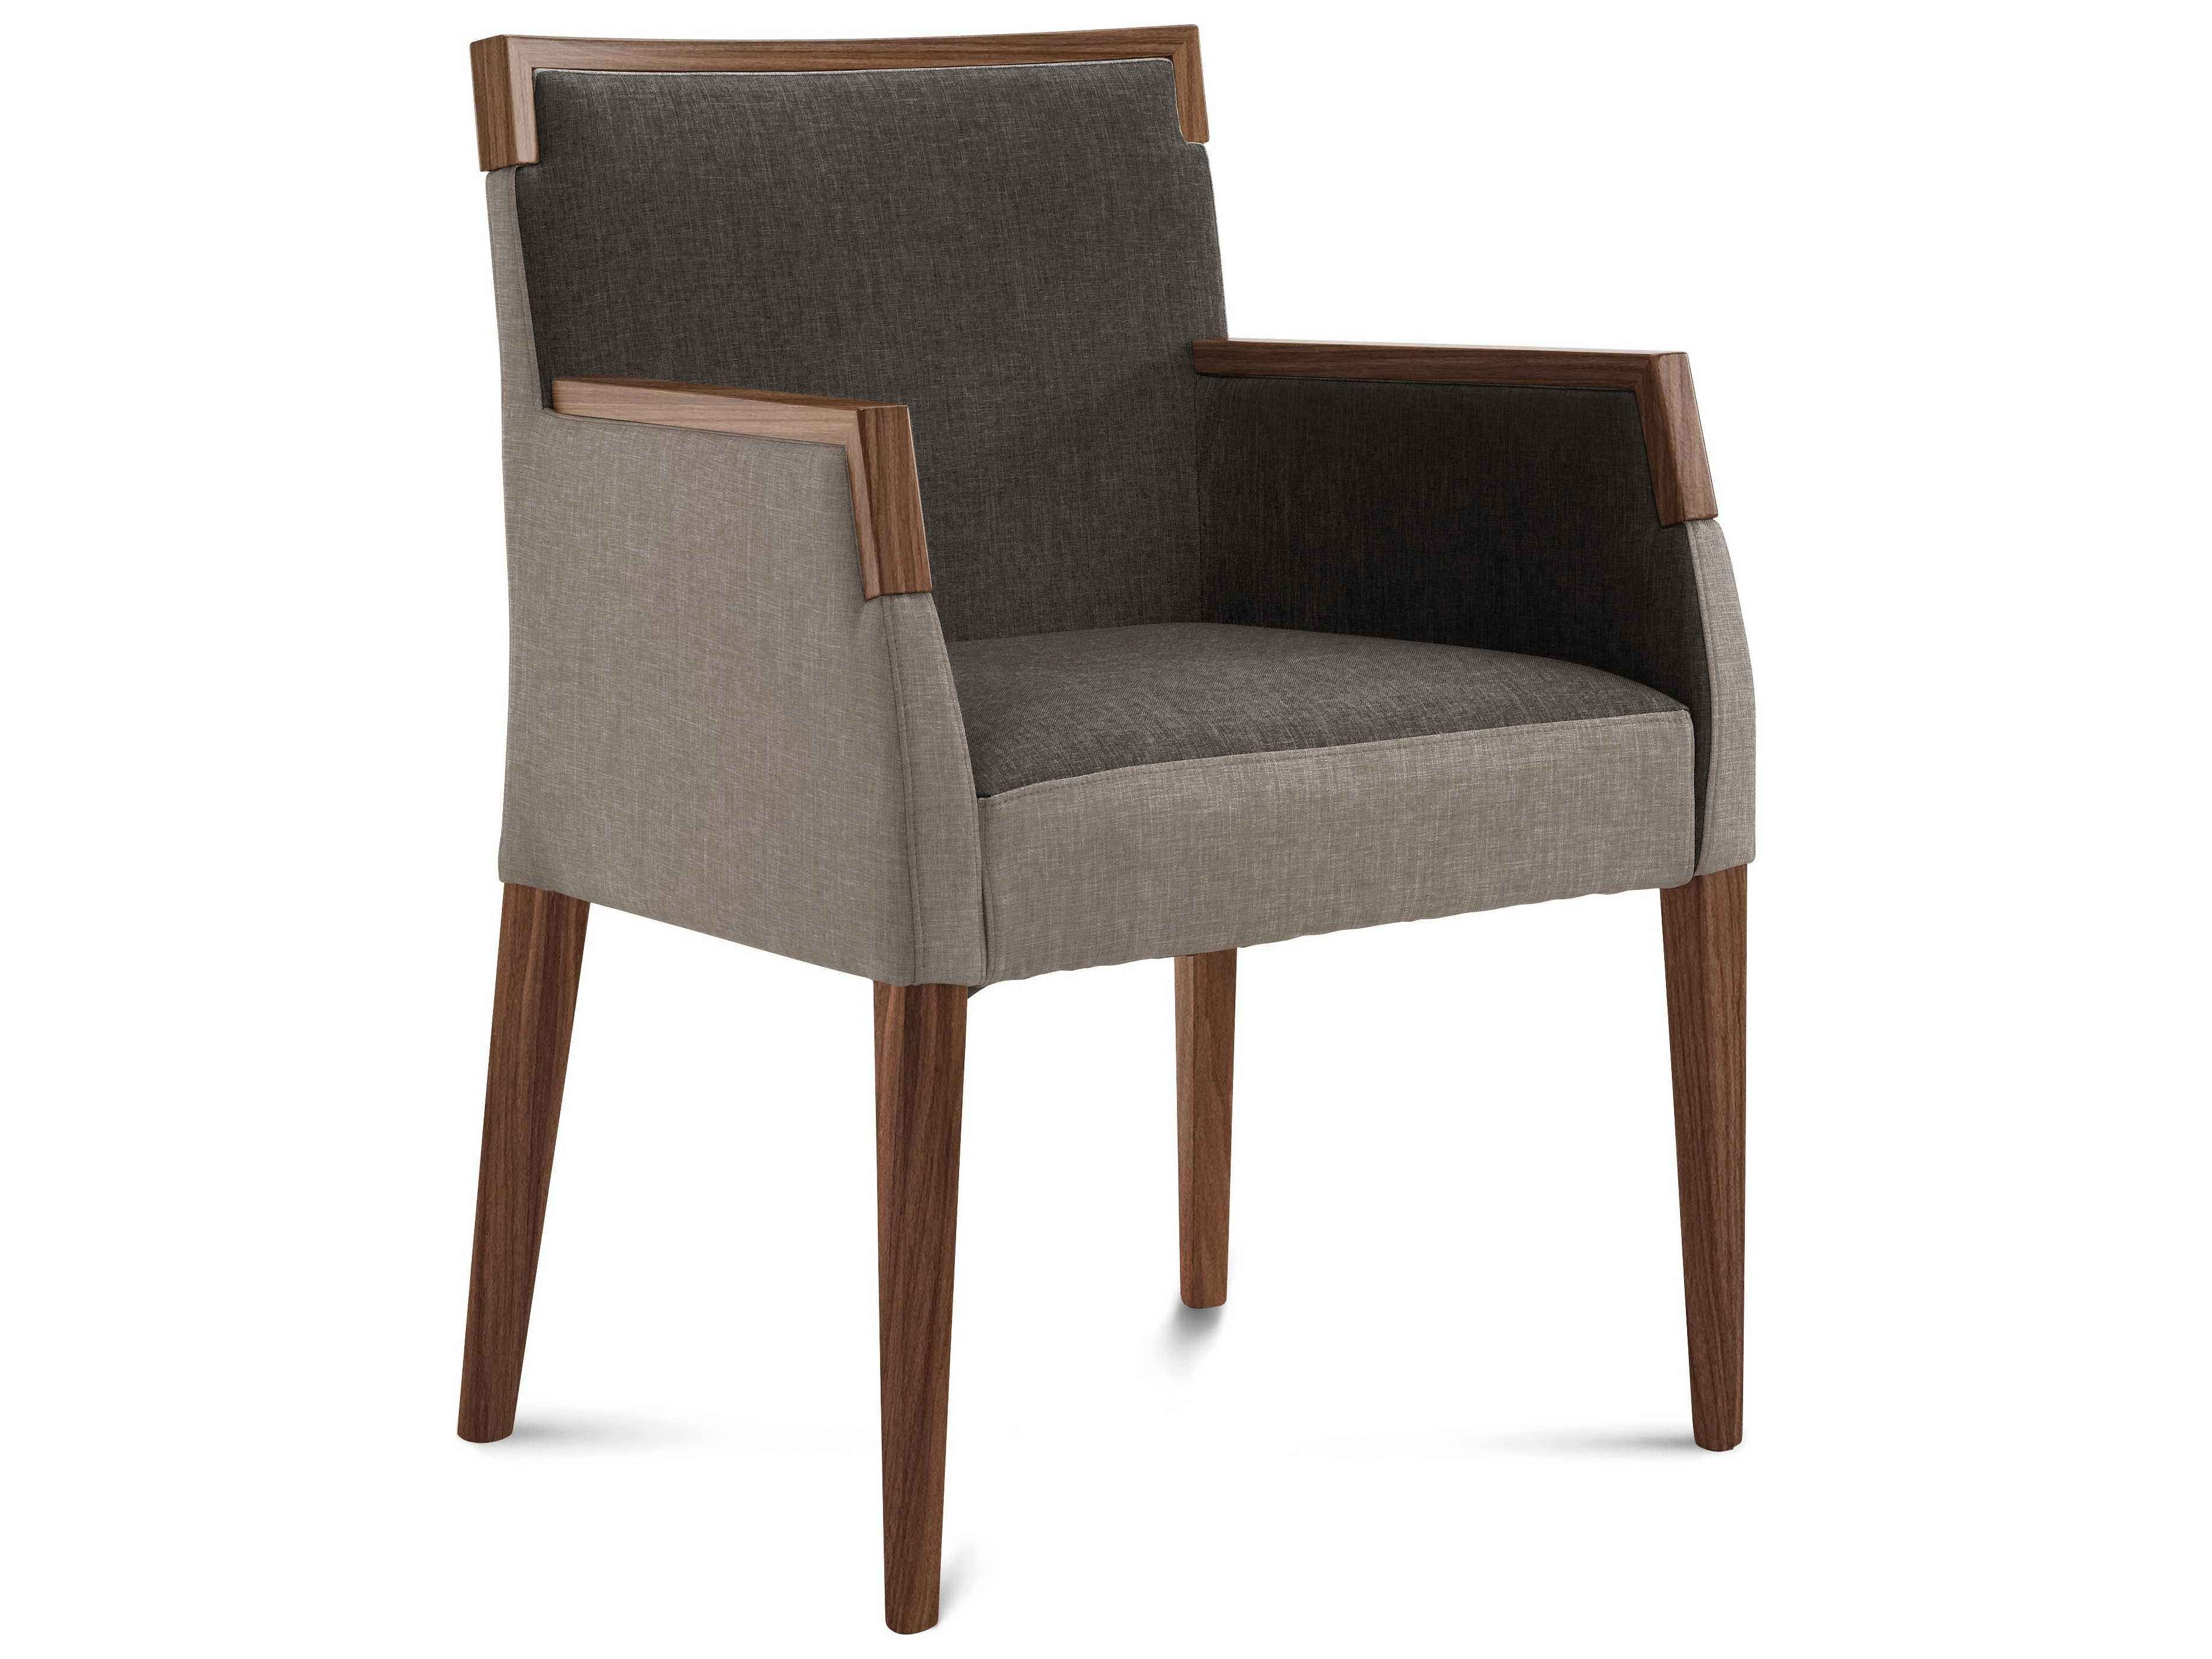 Domitalia ariel dining armchair domarielpi for Ariel chaise lounge